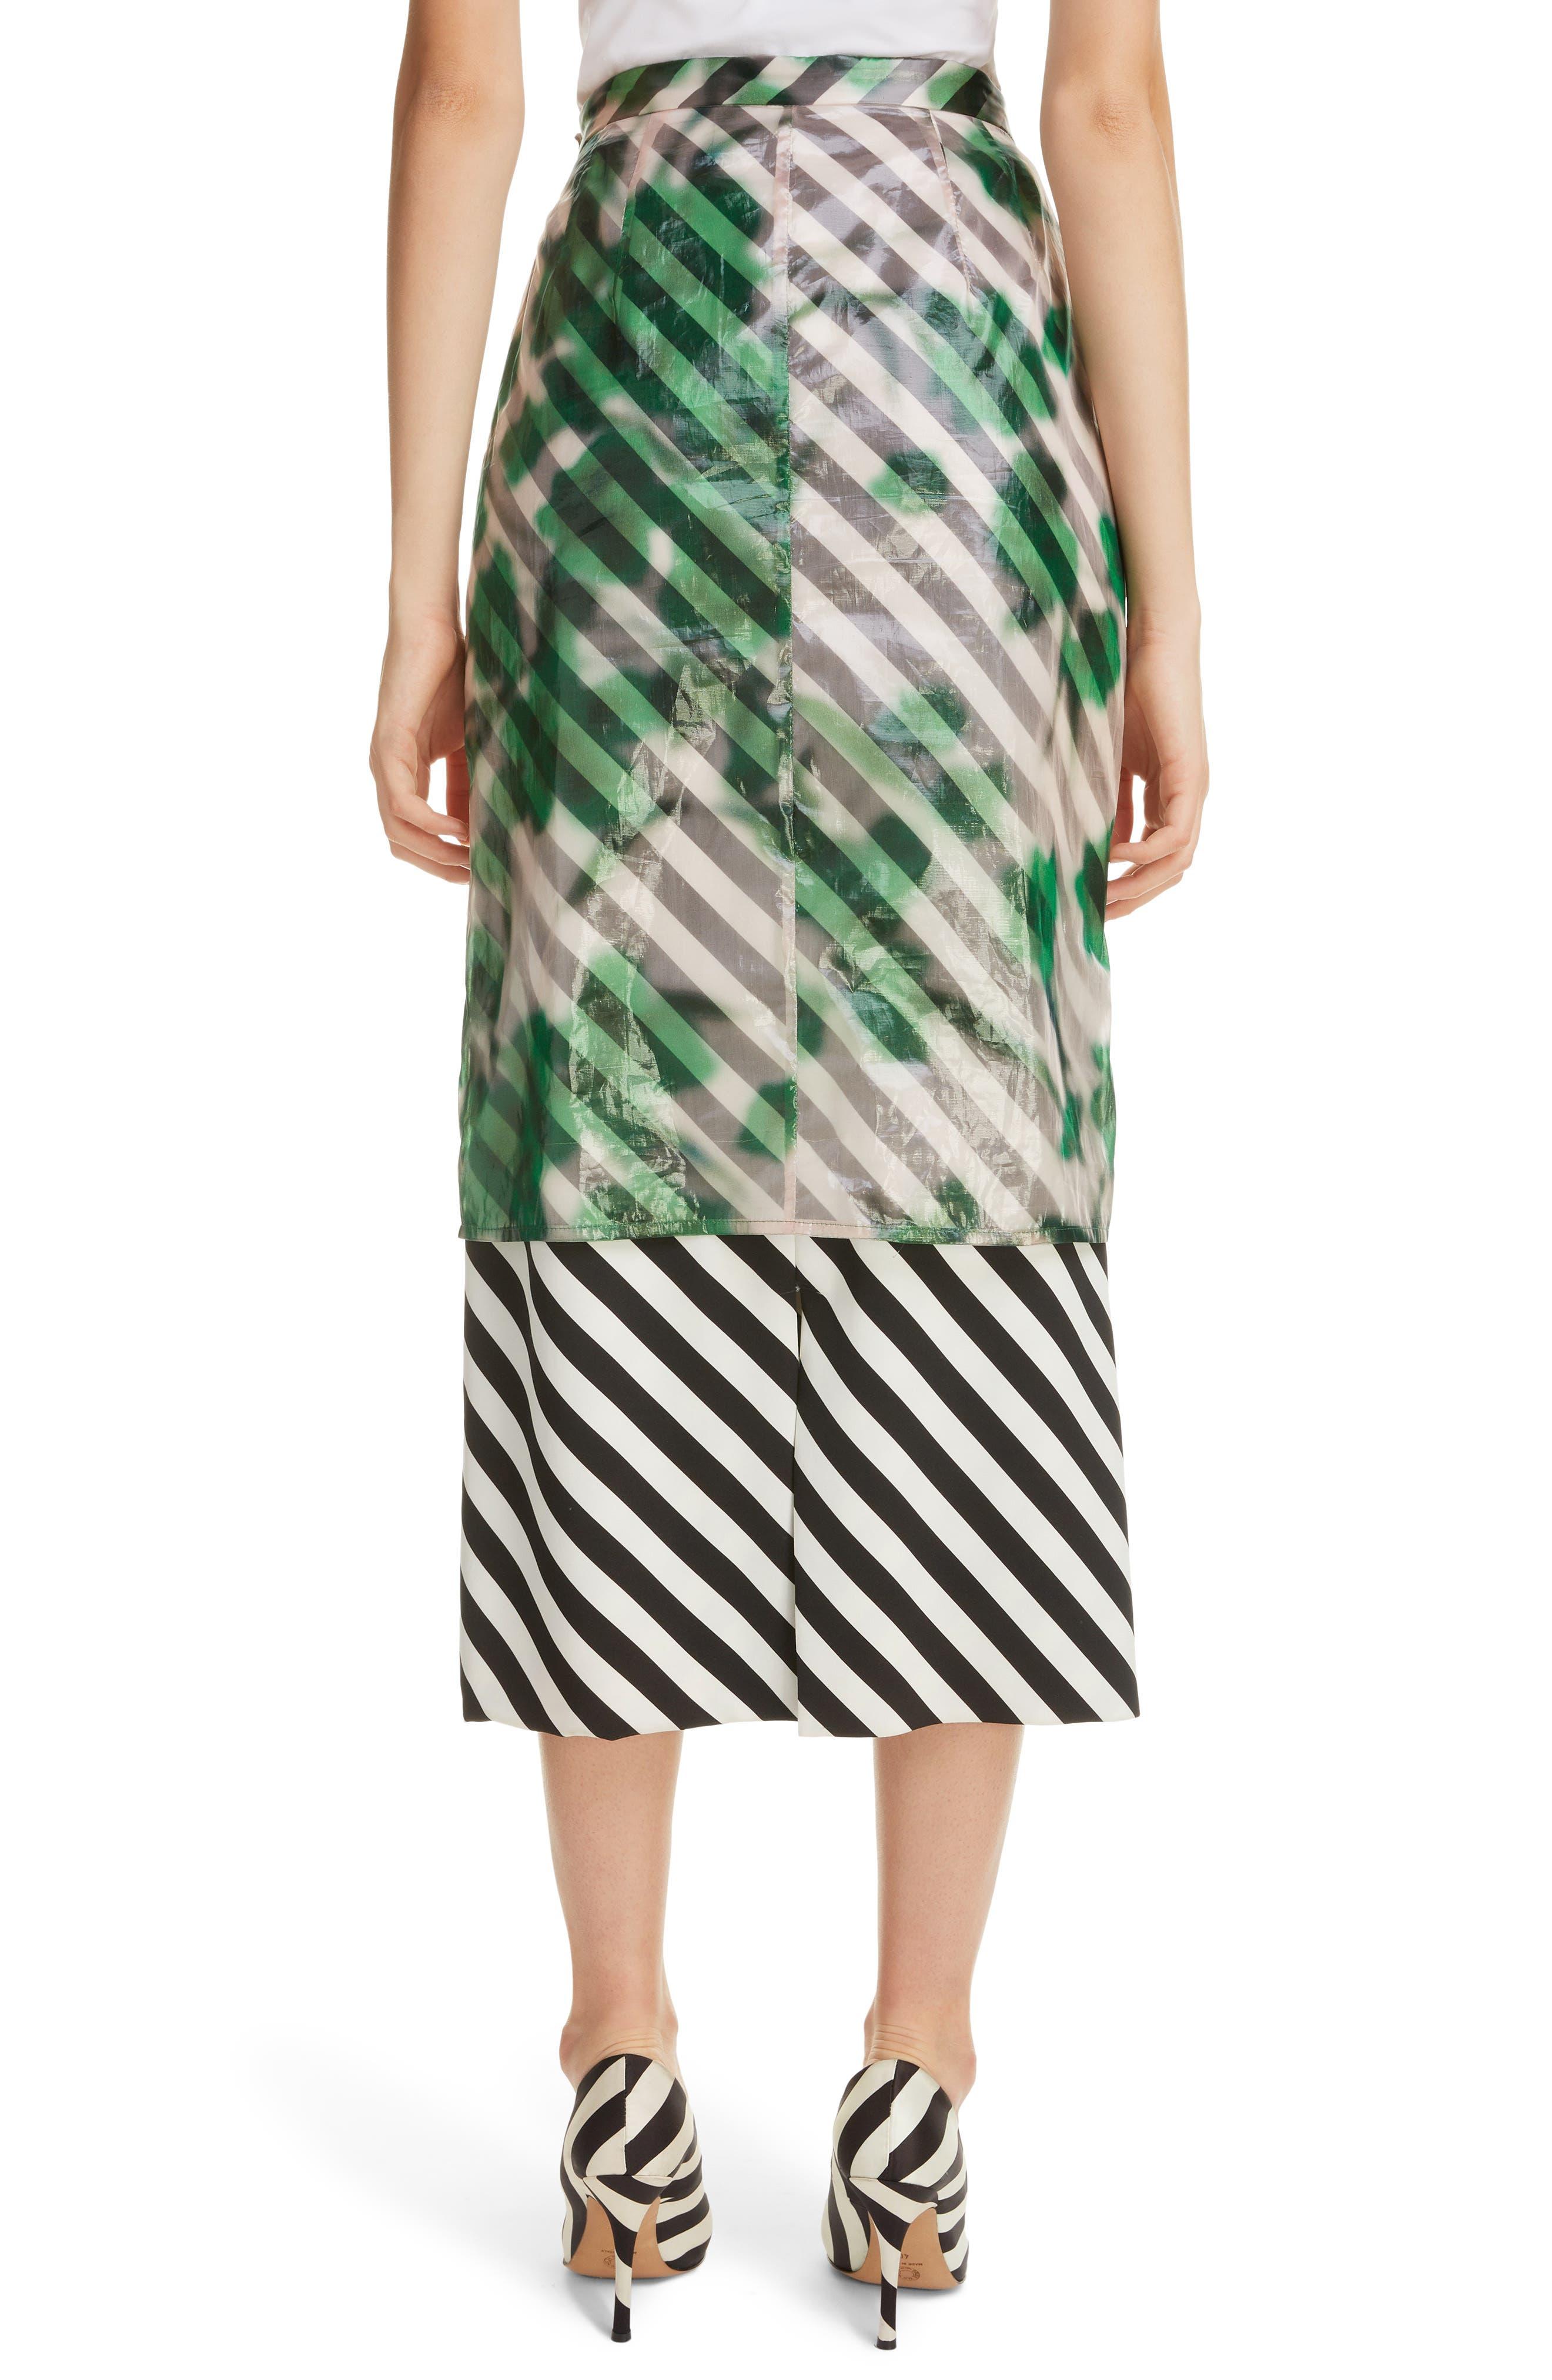 DRIES VAN NOTEN, Dires Van Noten Painted Overlay Silk Blend Pencil Skirt, Alternate thumbnail 2, color, 604-GREEN